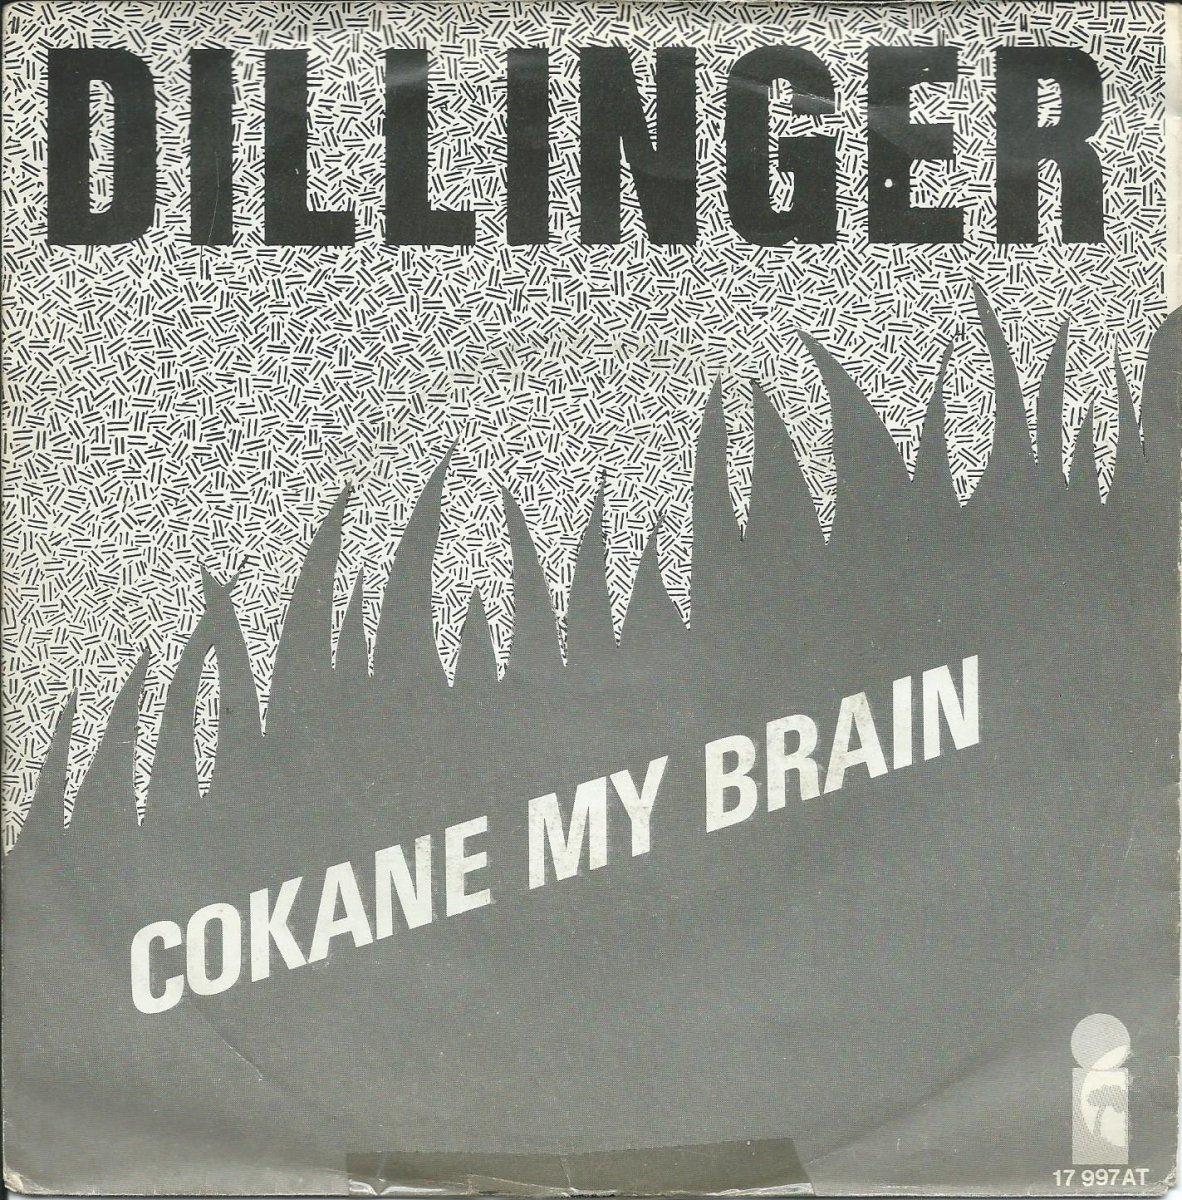 DILLINGER / COKANE IN MY BRAIN / POWER BANK (7